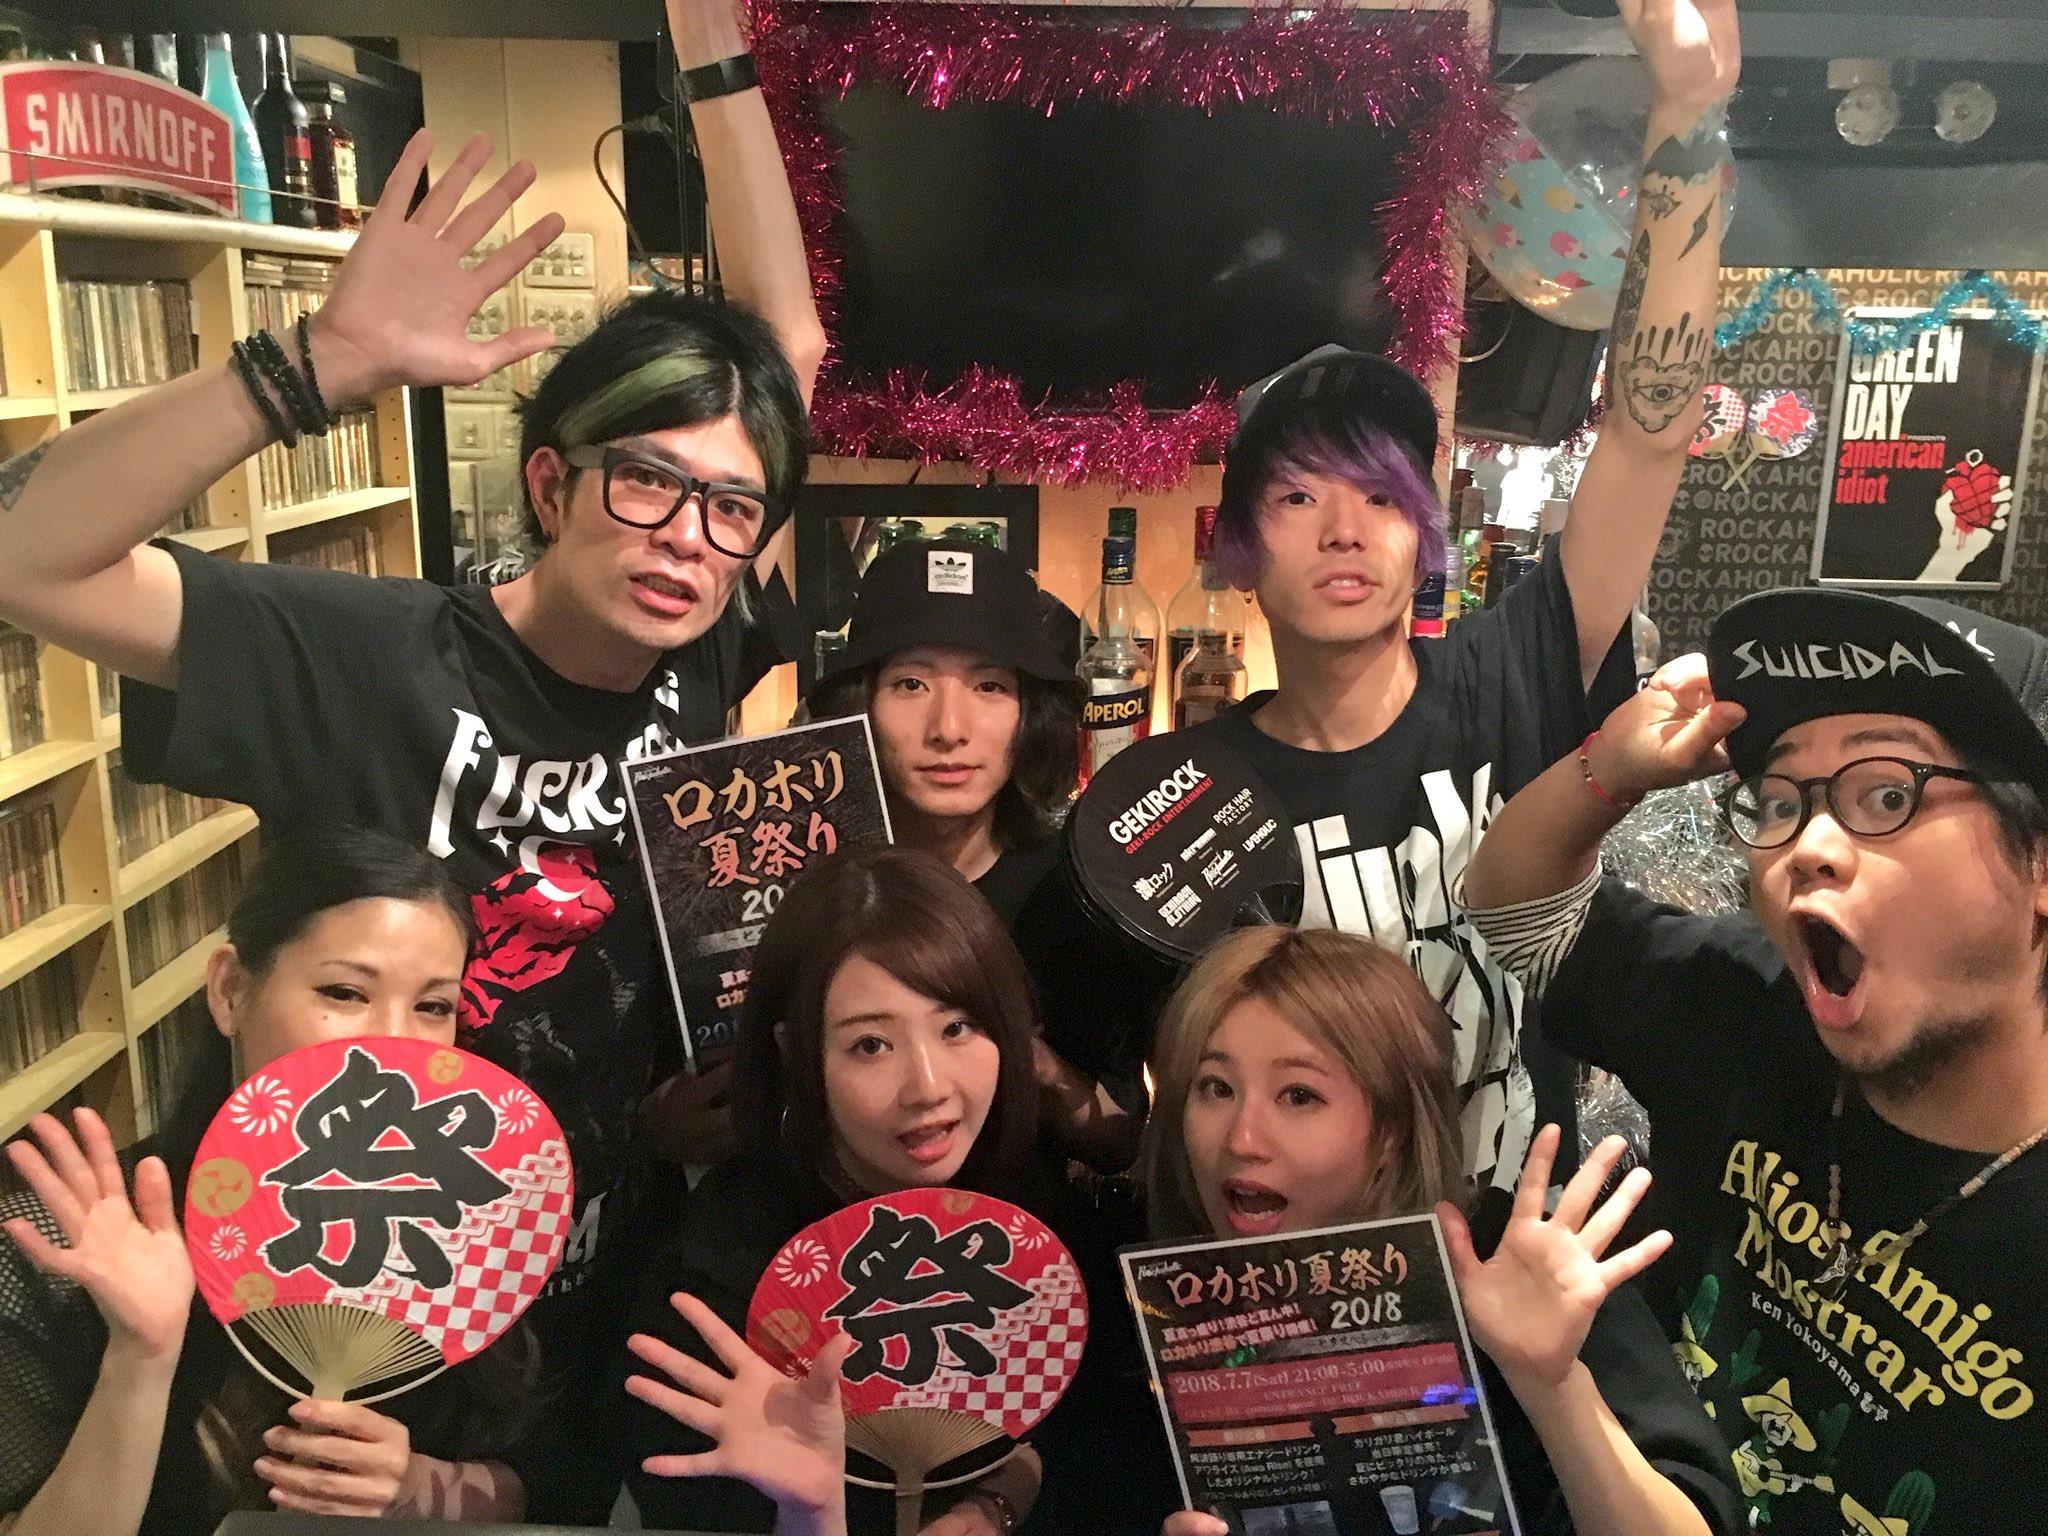 https://bar-rockaholic.jp/shibuya/blog/3D0BD255-8D5D-4427-B9AF-2C7DDC9C73E3.jpeg